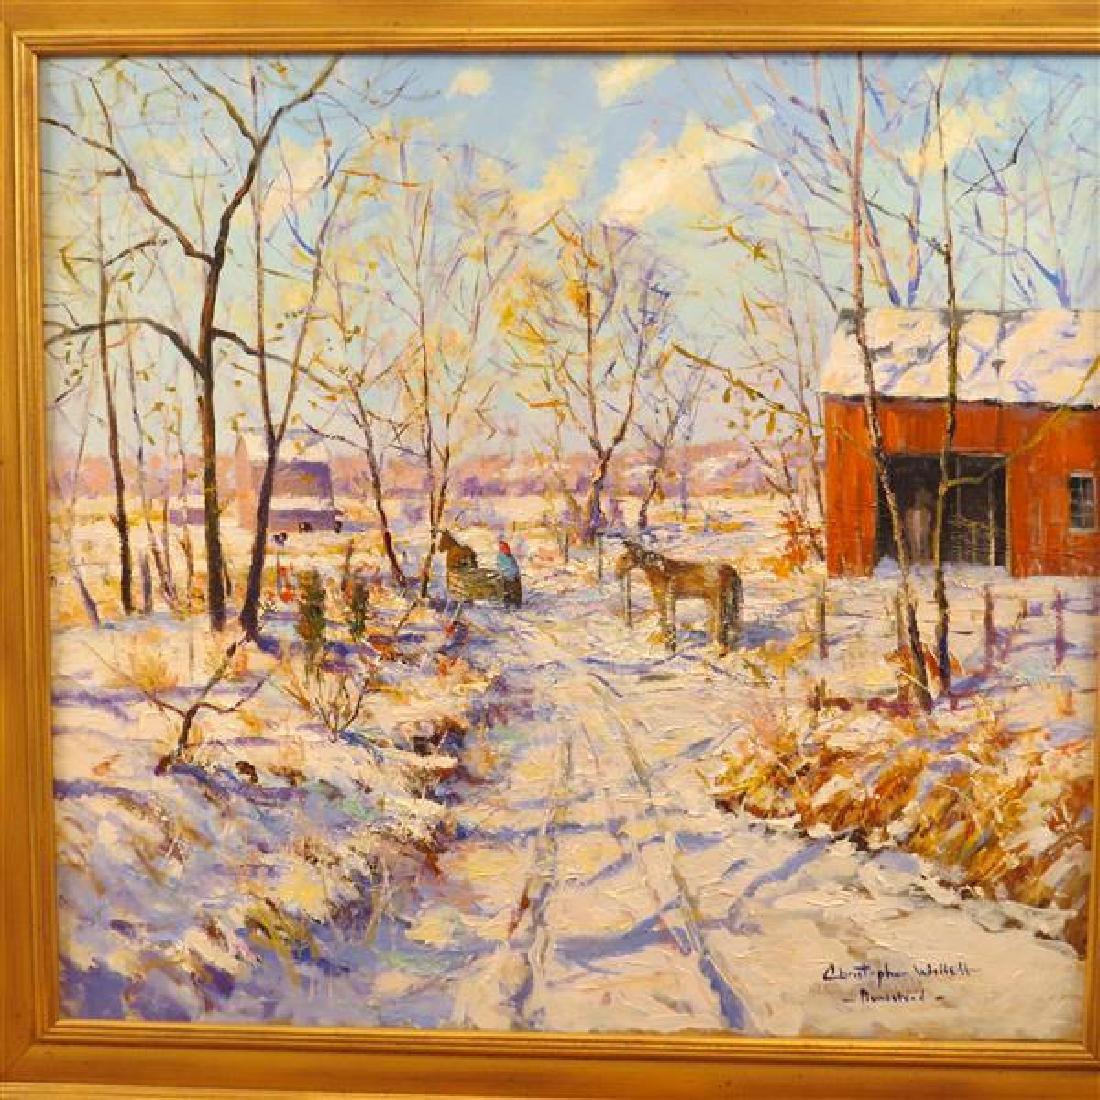 Christopher Willett Oil on Canvas Winter Scene - 2